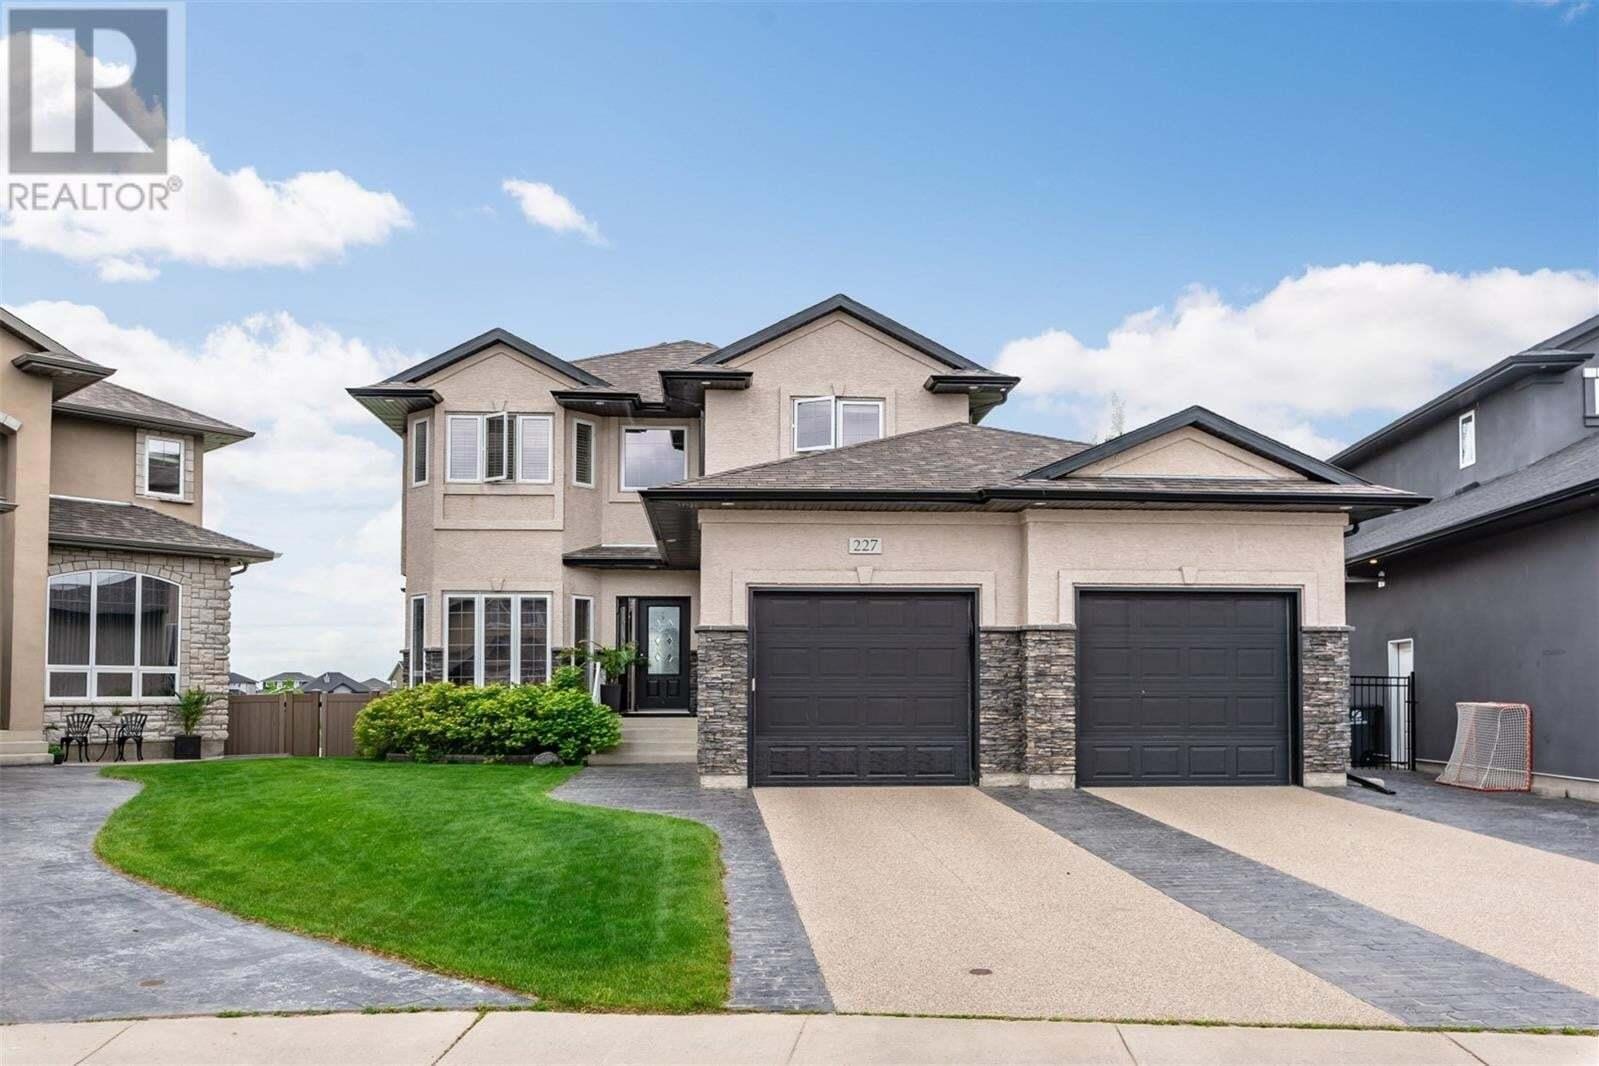 House for sale at 227 Milne Cres Saskatoon Saskatchewan - MLS: SK813695